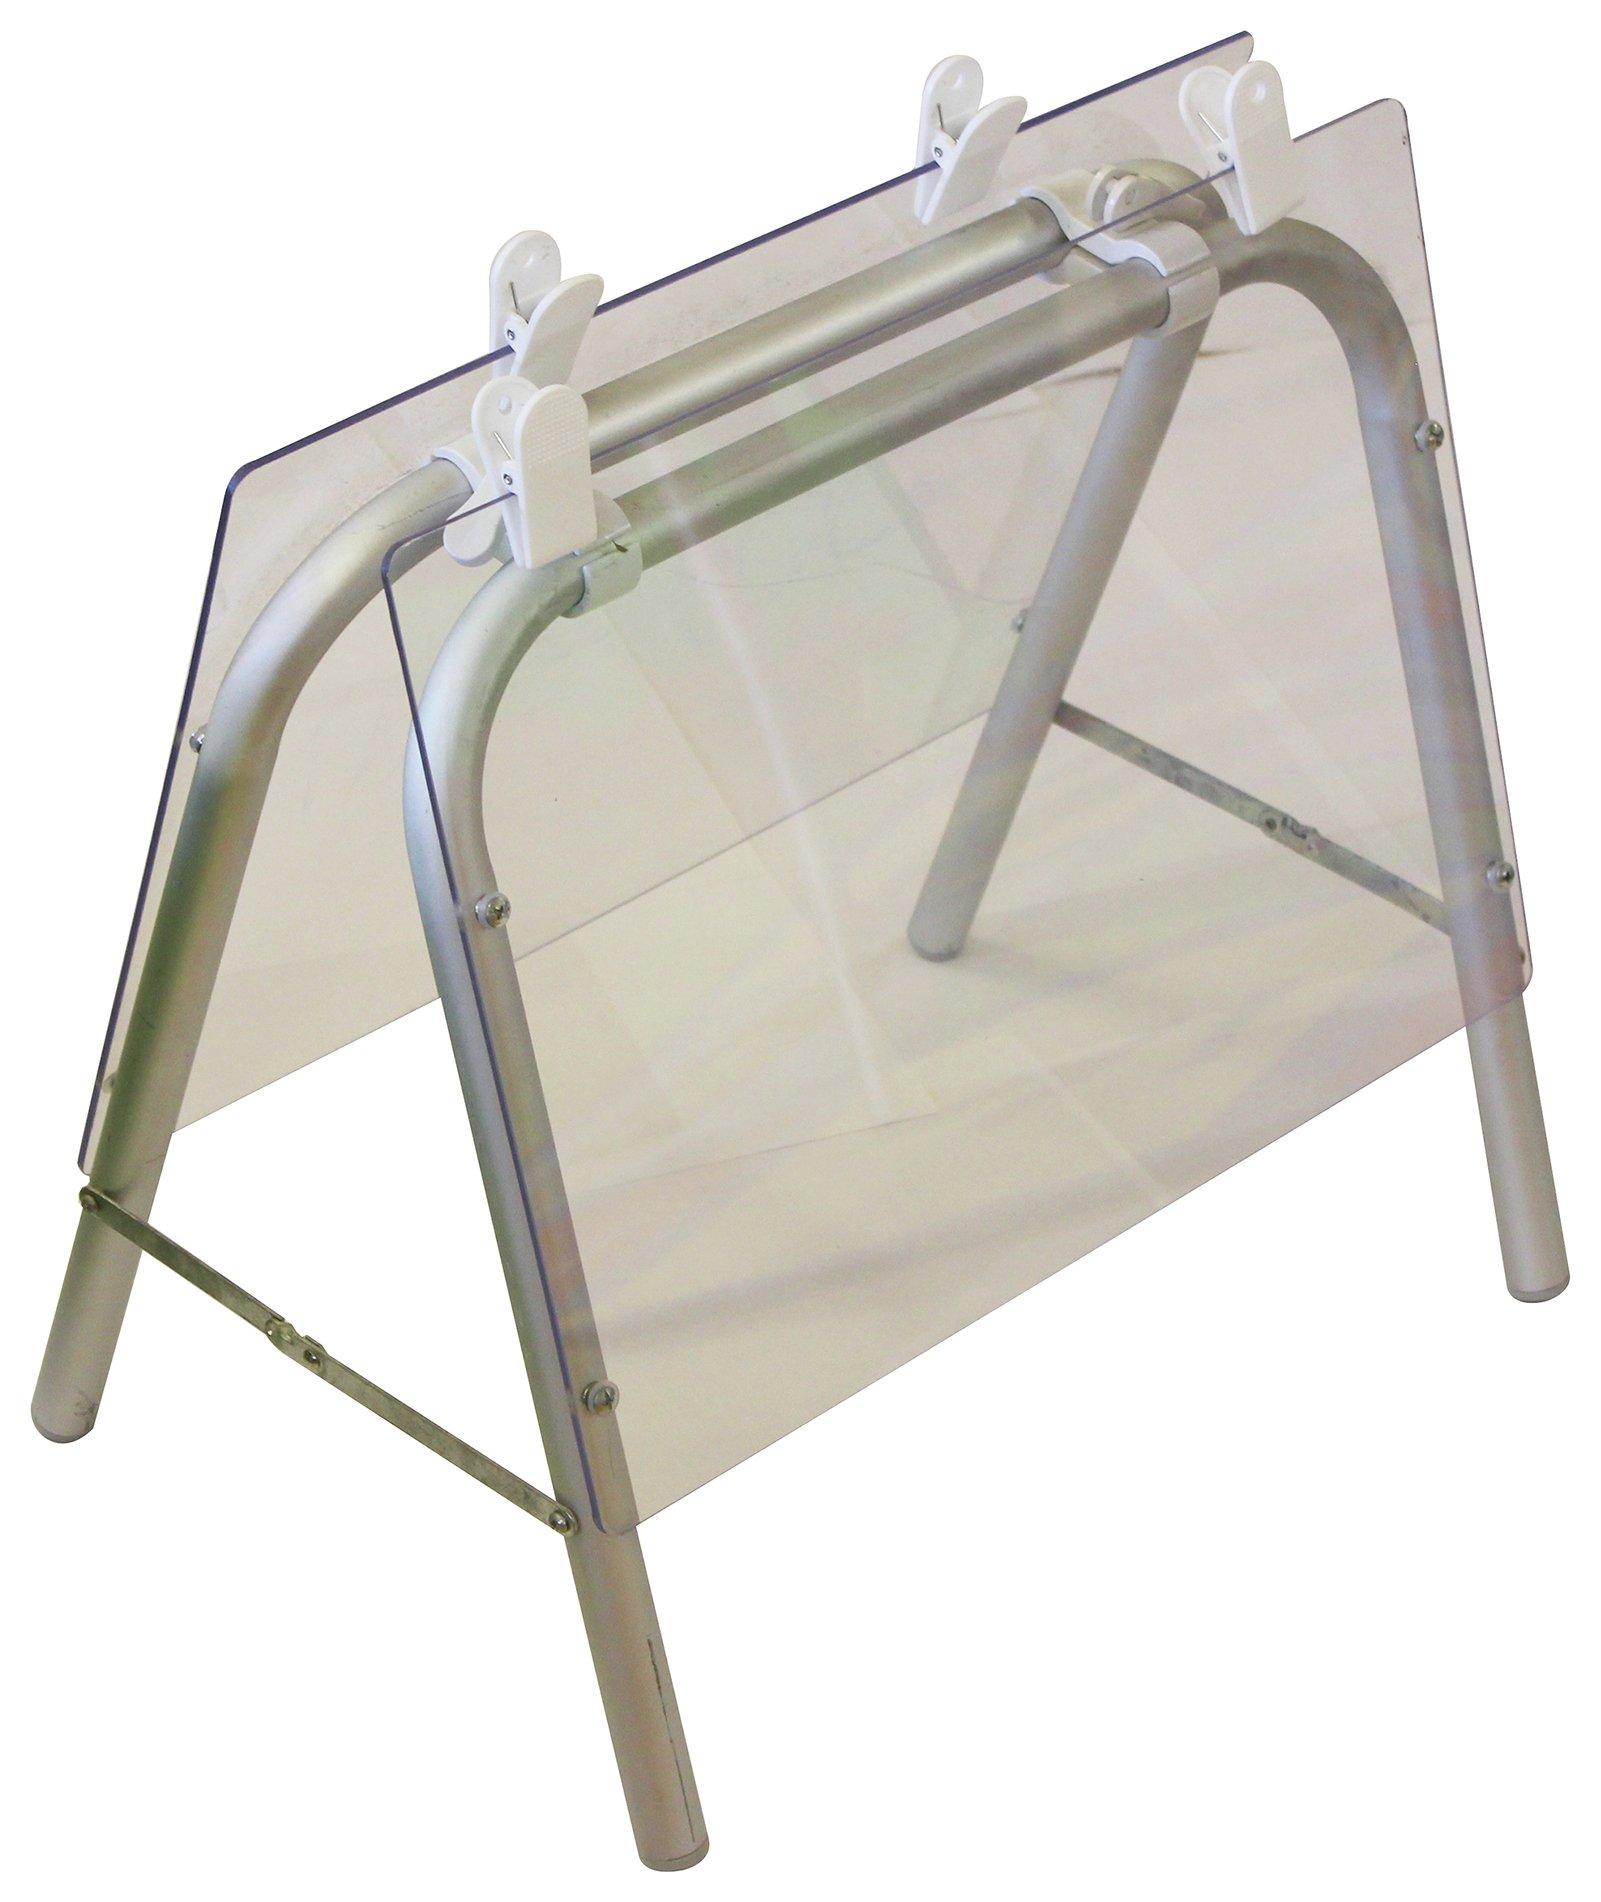 tikk tokk aluminium table top easel - Table Top Easel